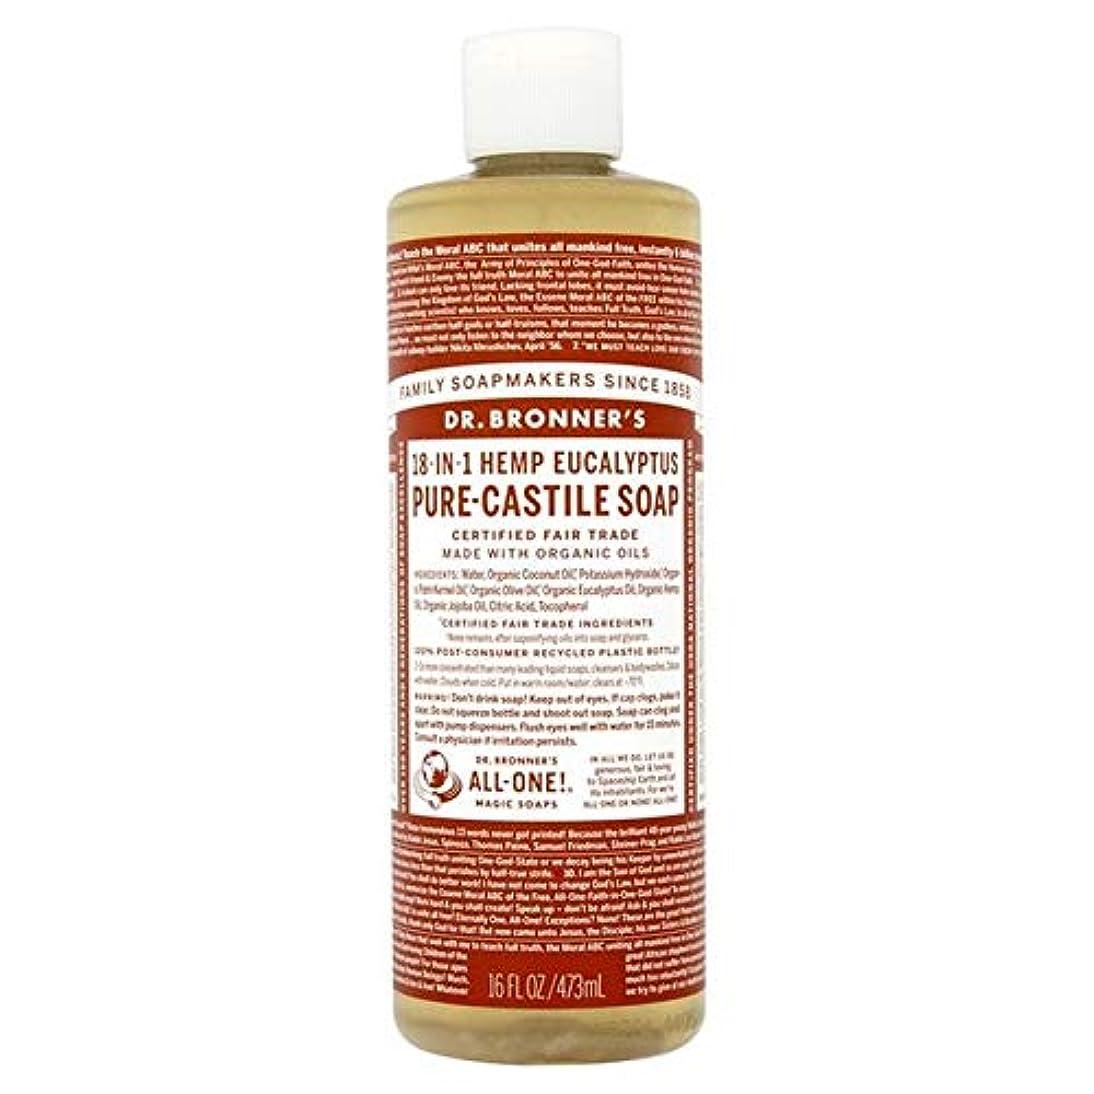 [Dr Bronner] Dr。ブロナーズ有機ユーカリの純粋な-カスティーリャ液体石鹸473ミリリットル - Dr. Bronner's Organic Eucalyptus Pure-Castille Liquid Soap...